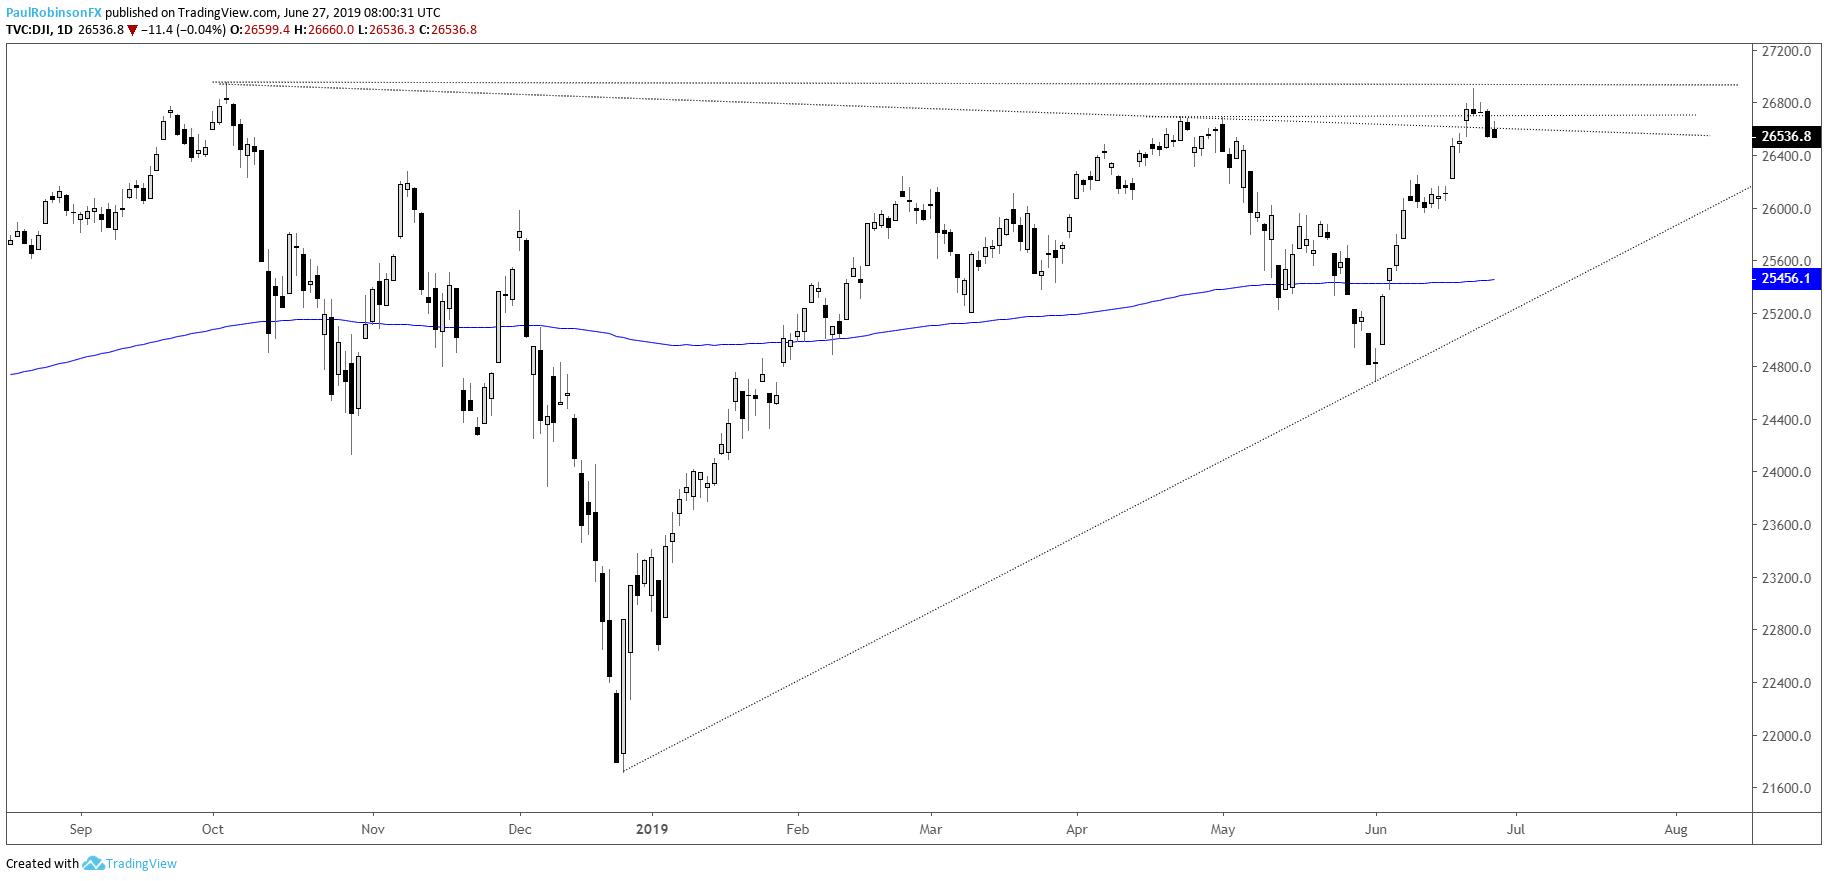 Dow Jones, S&P 500, and Nasdaq 100 Technical Analysis